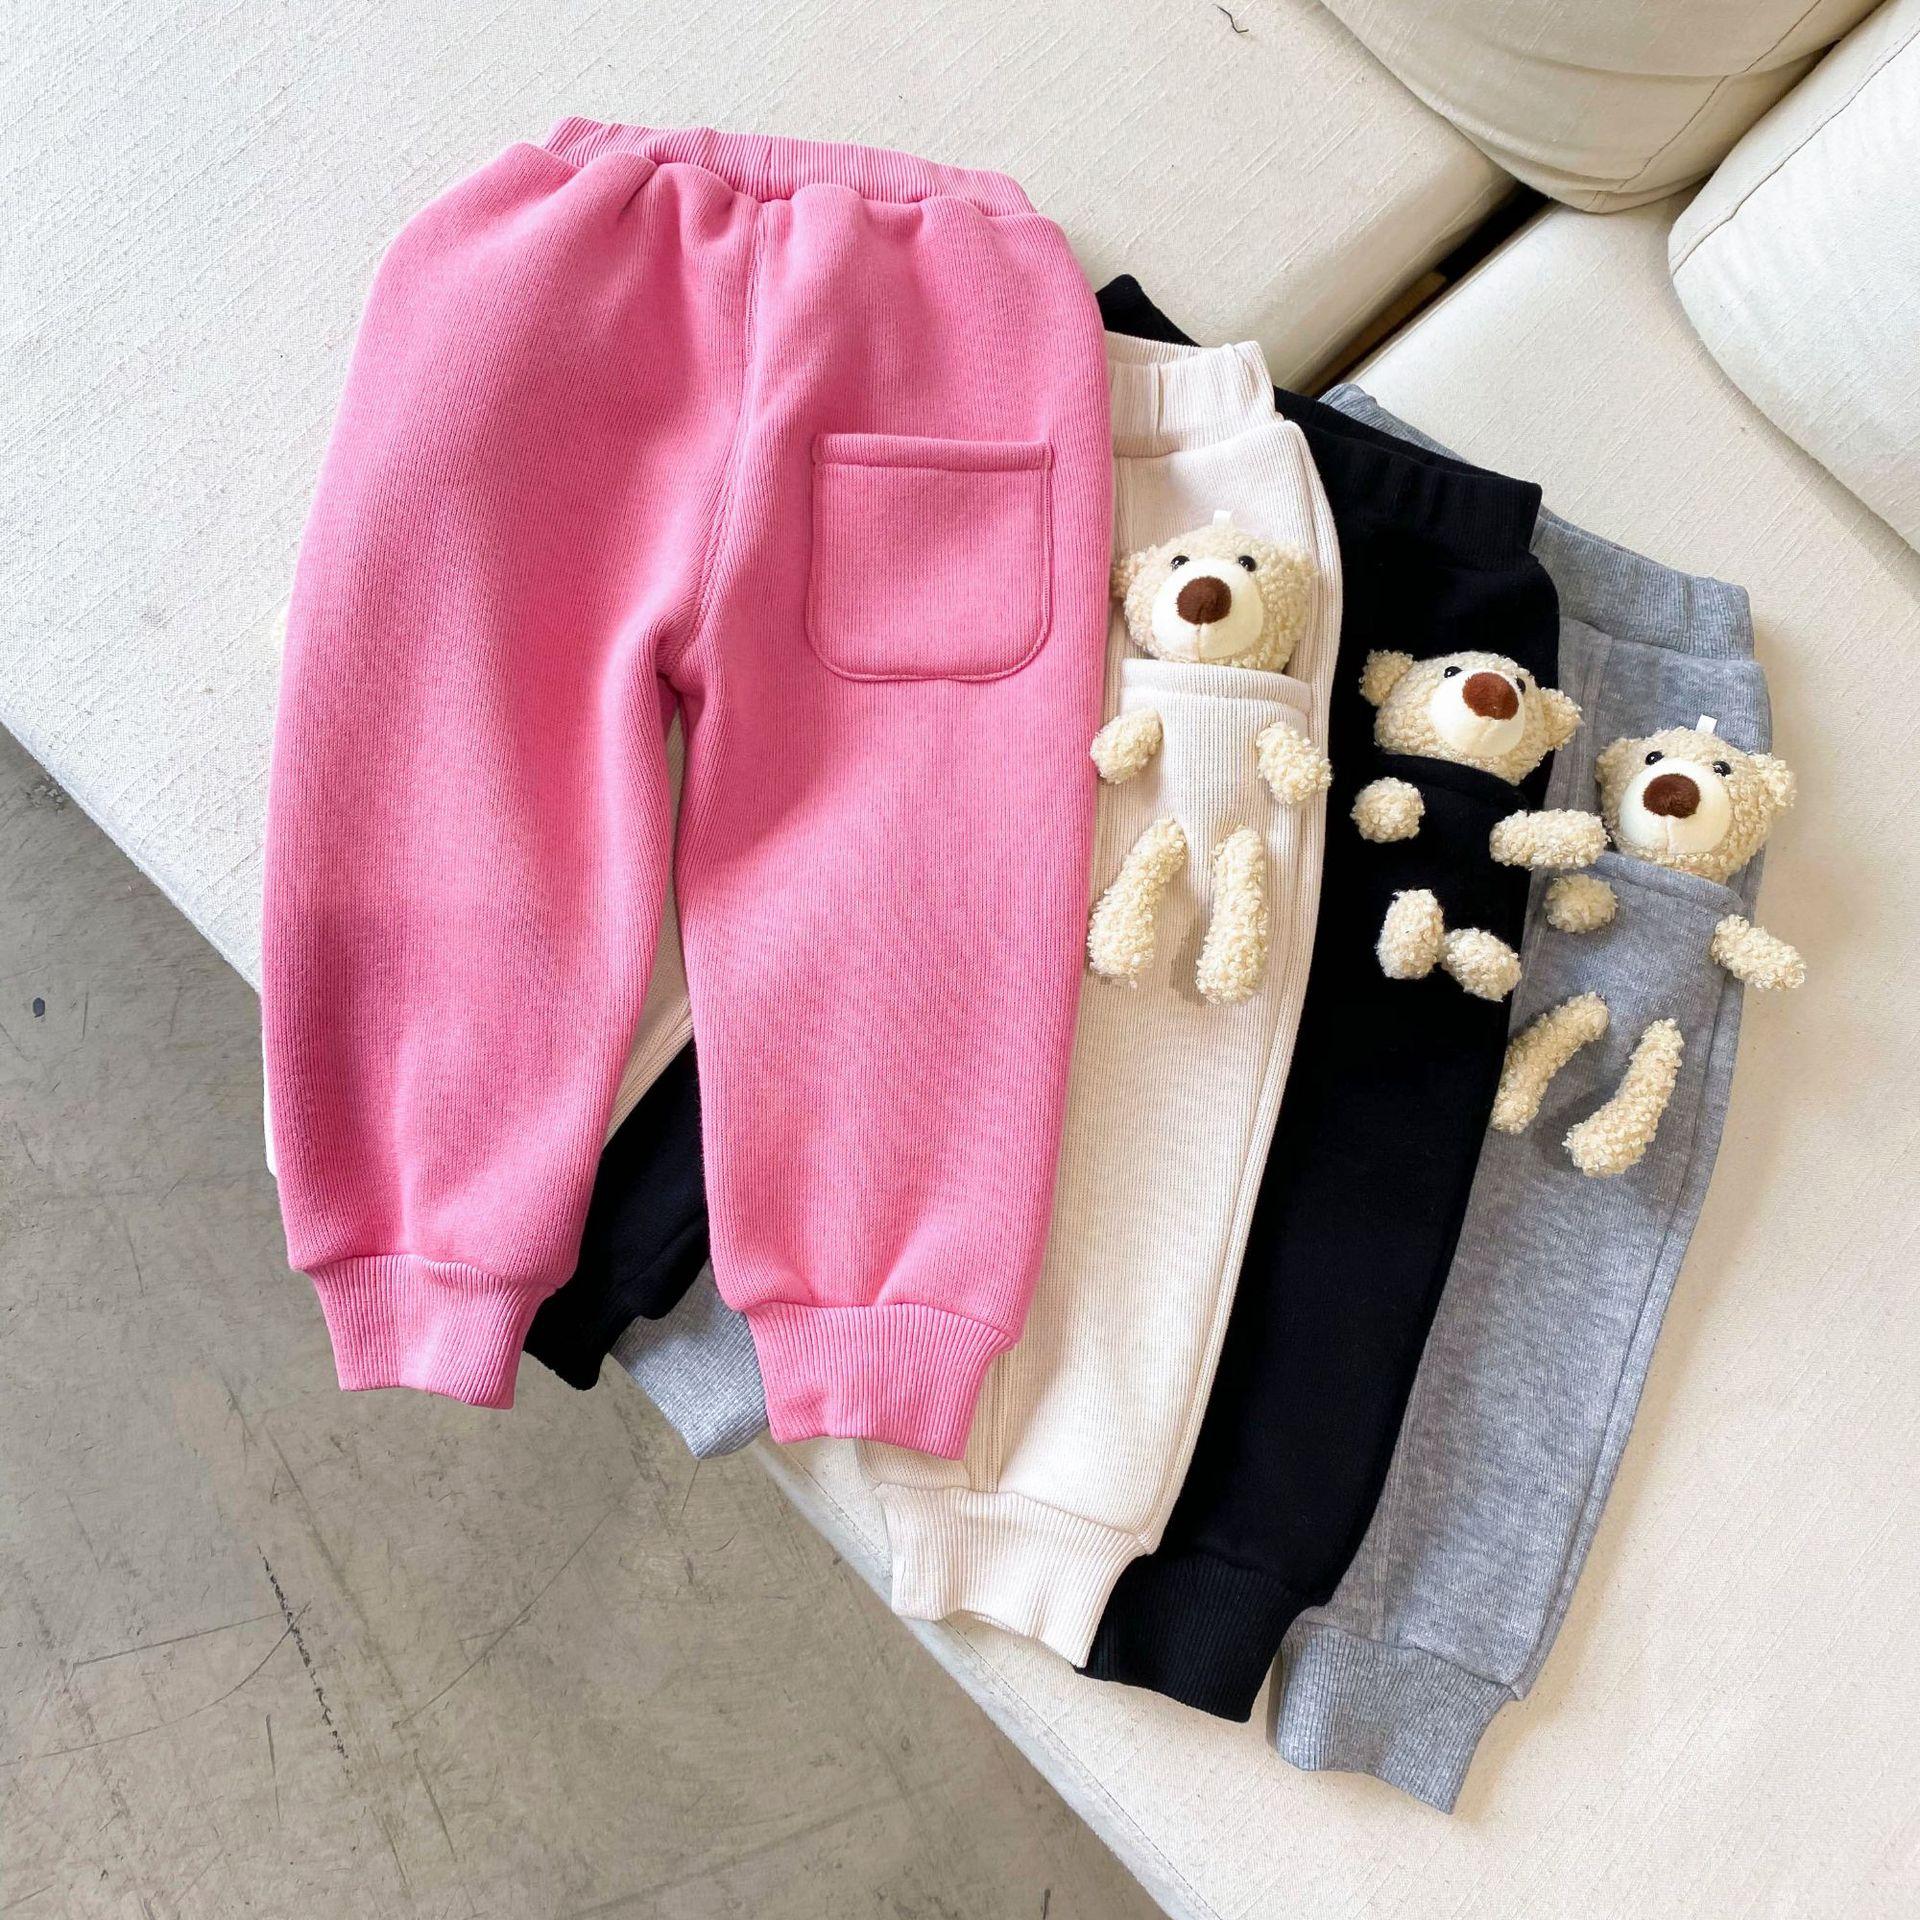 2021 Autumn Winter New Arrival Boys and Girls Cartoon Bear Pants Kids Warm Fleece Trousers 1